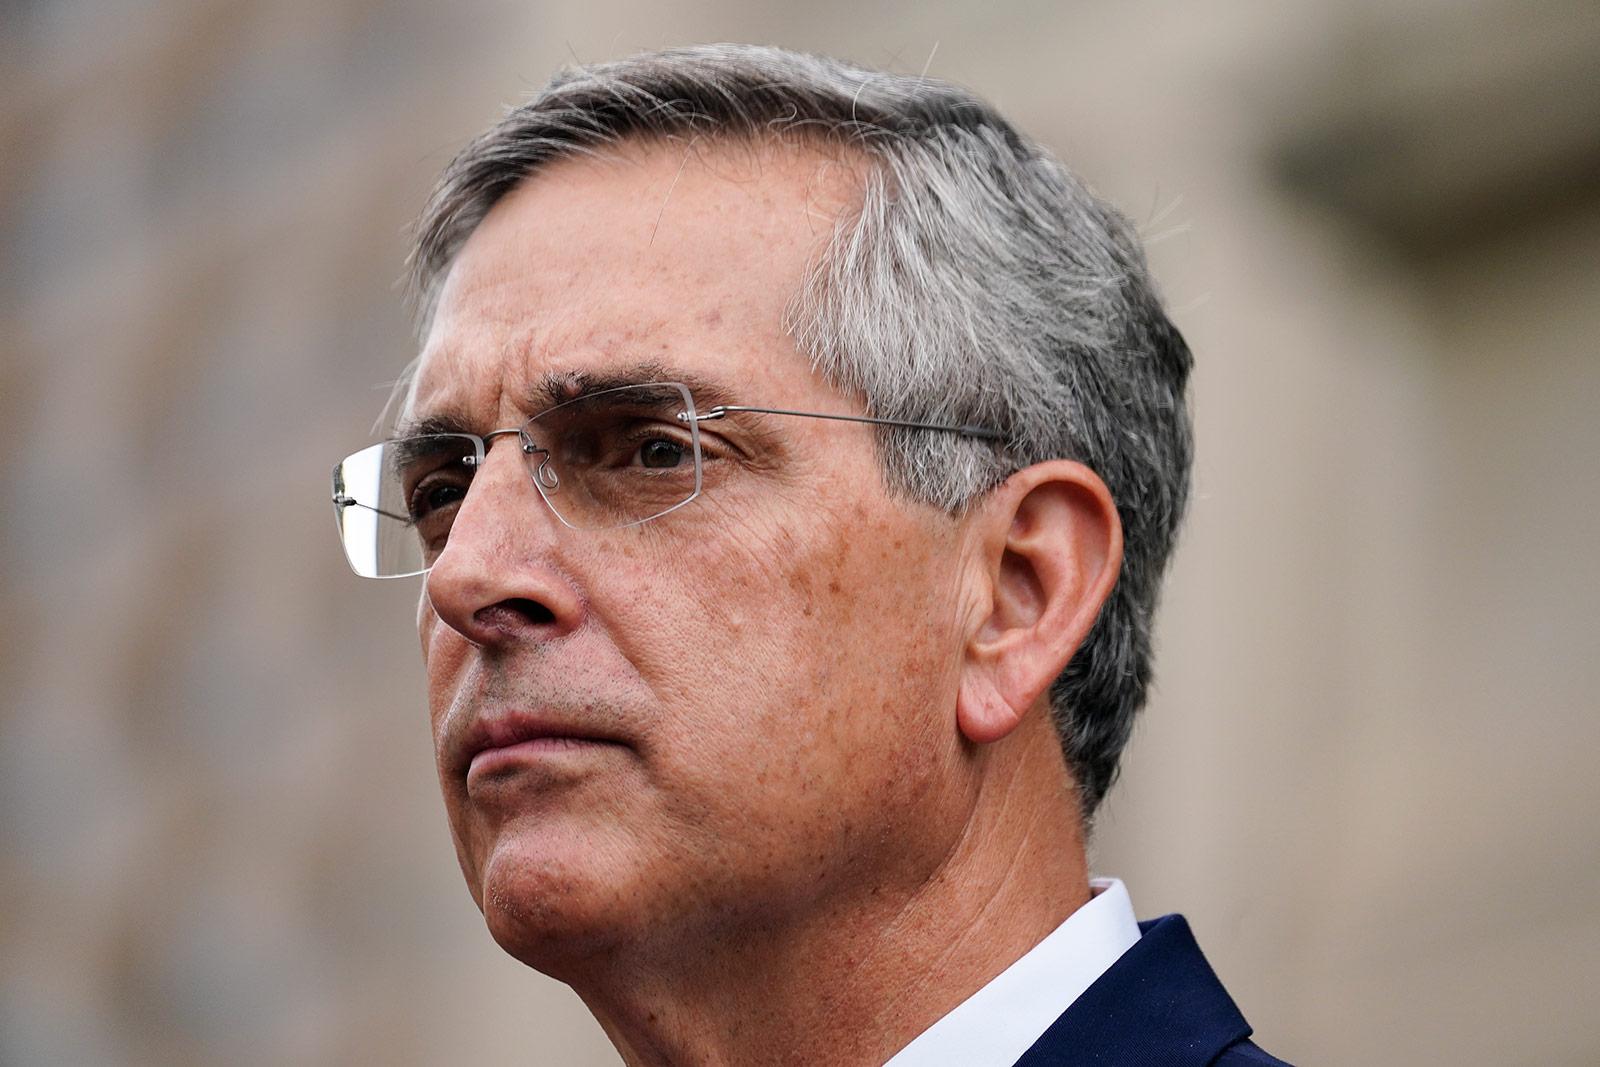 Brad Raffensperger รัฐมนตรีต่างประเทศจอร์เจียเข้าร่วมการแถลงข่าวที่แอตแลนตาเมื่อวันที่ 11 พฤศจิกายน